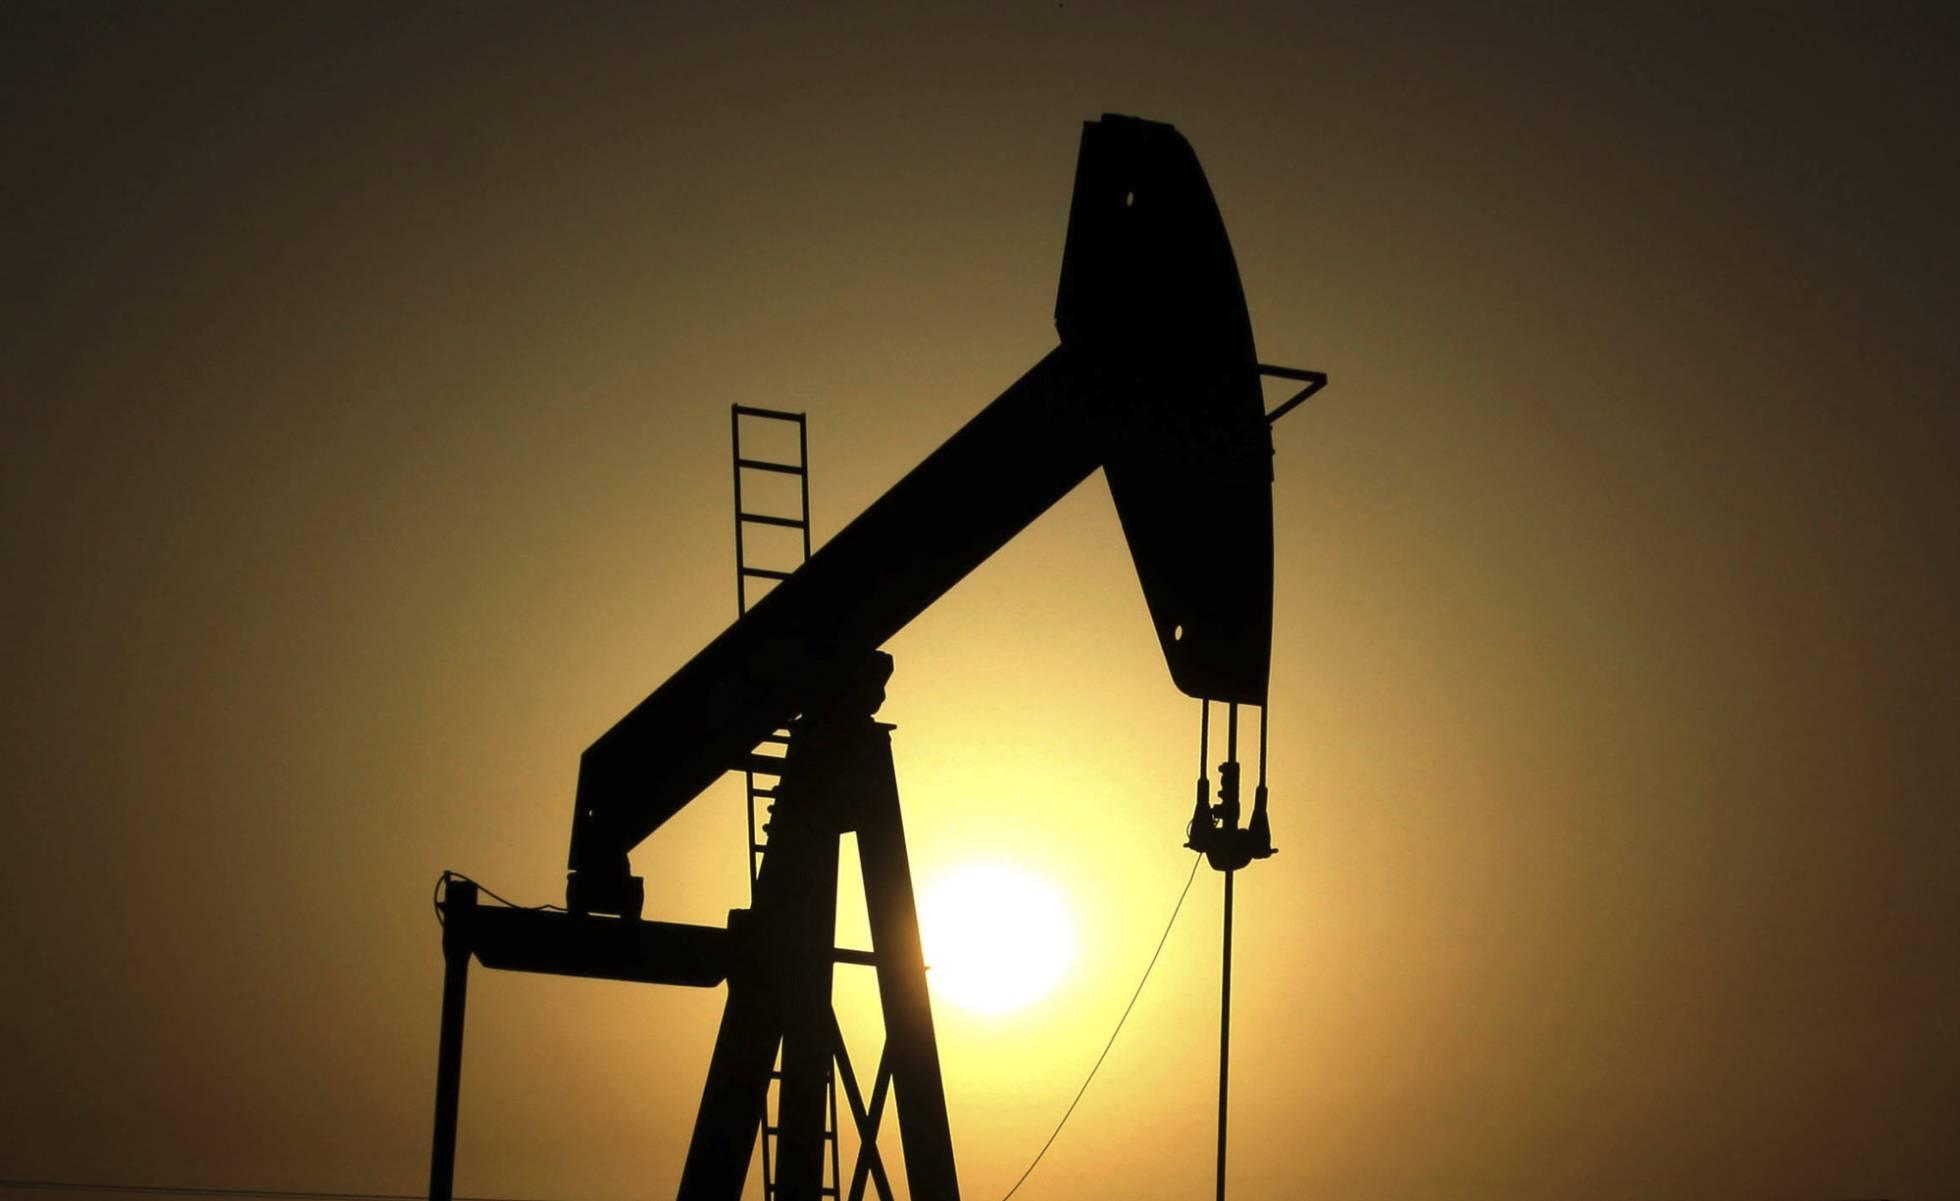 instalacion petrolifera Bahrein